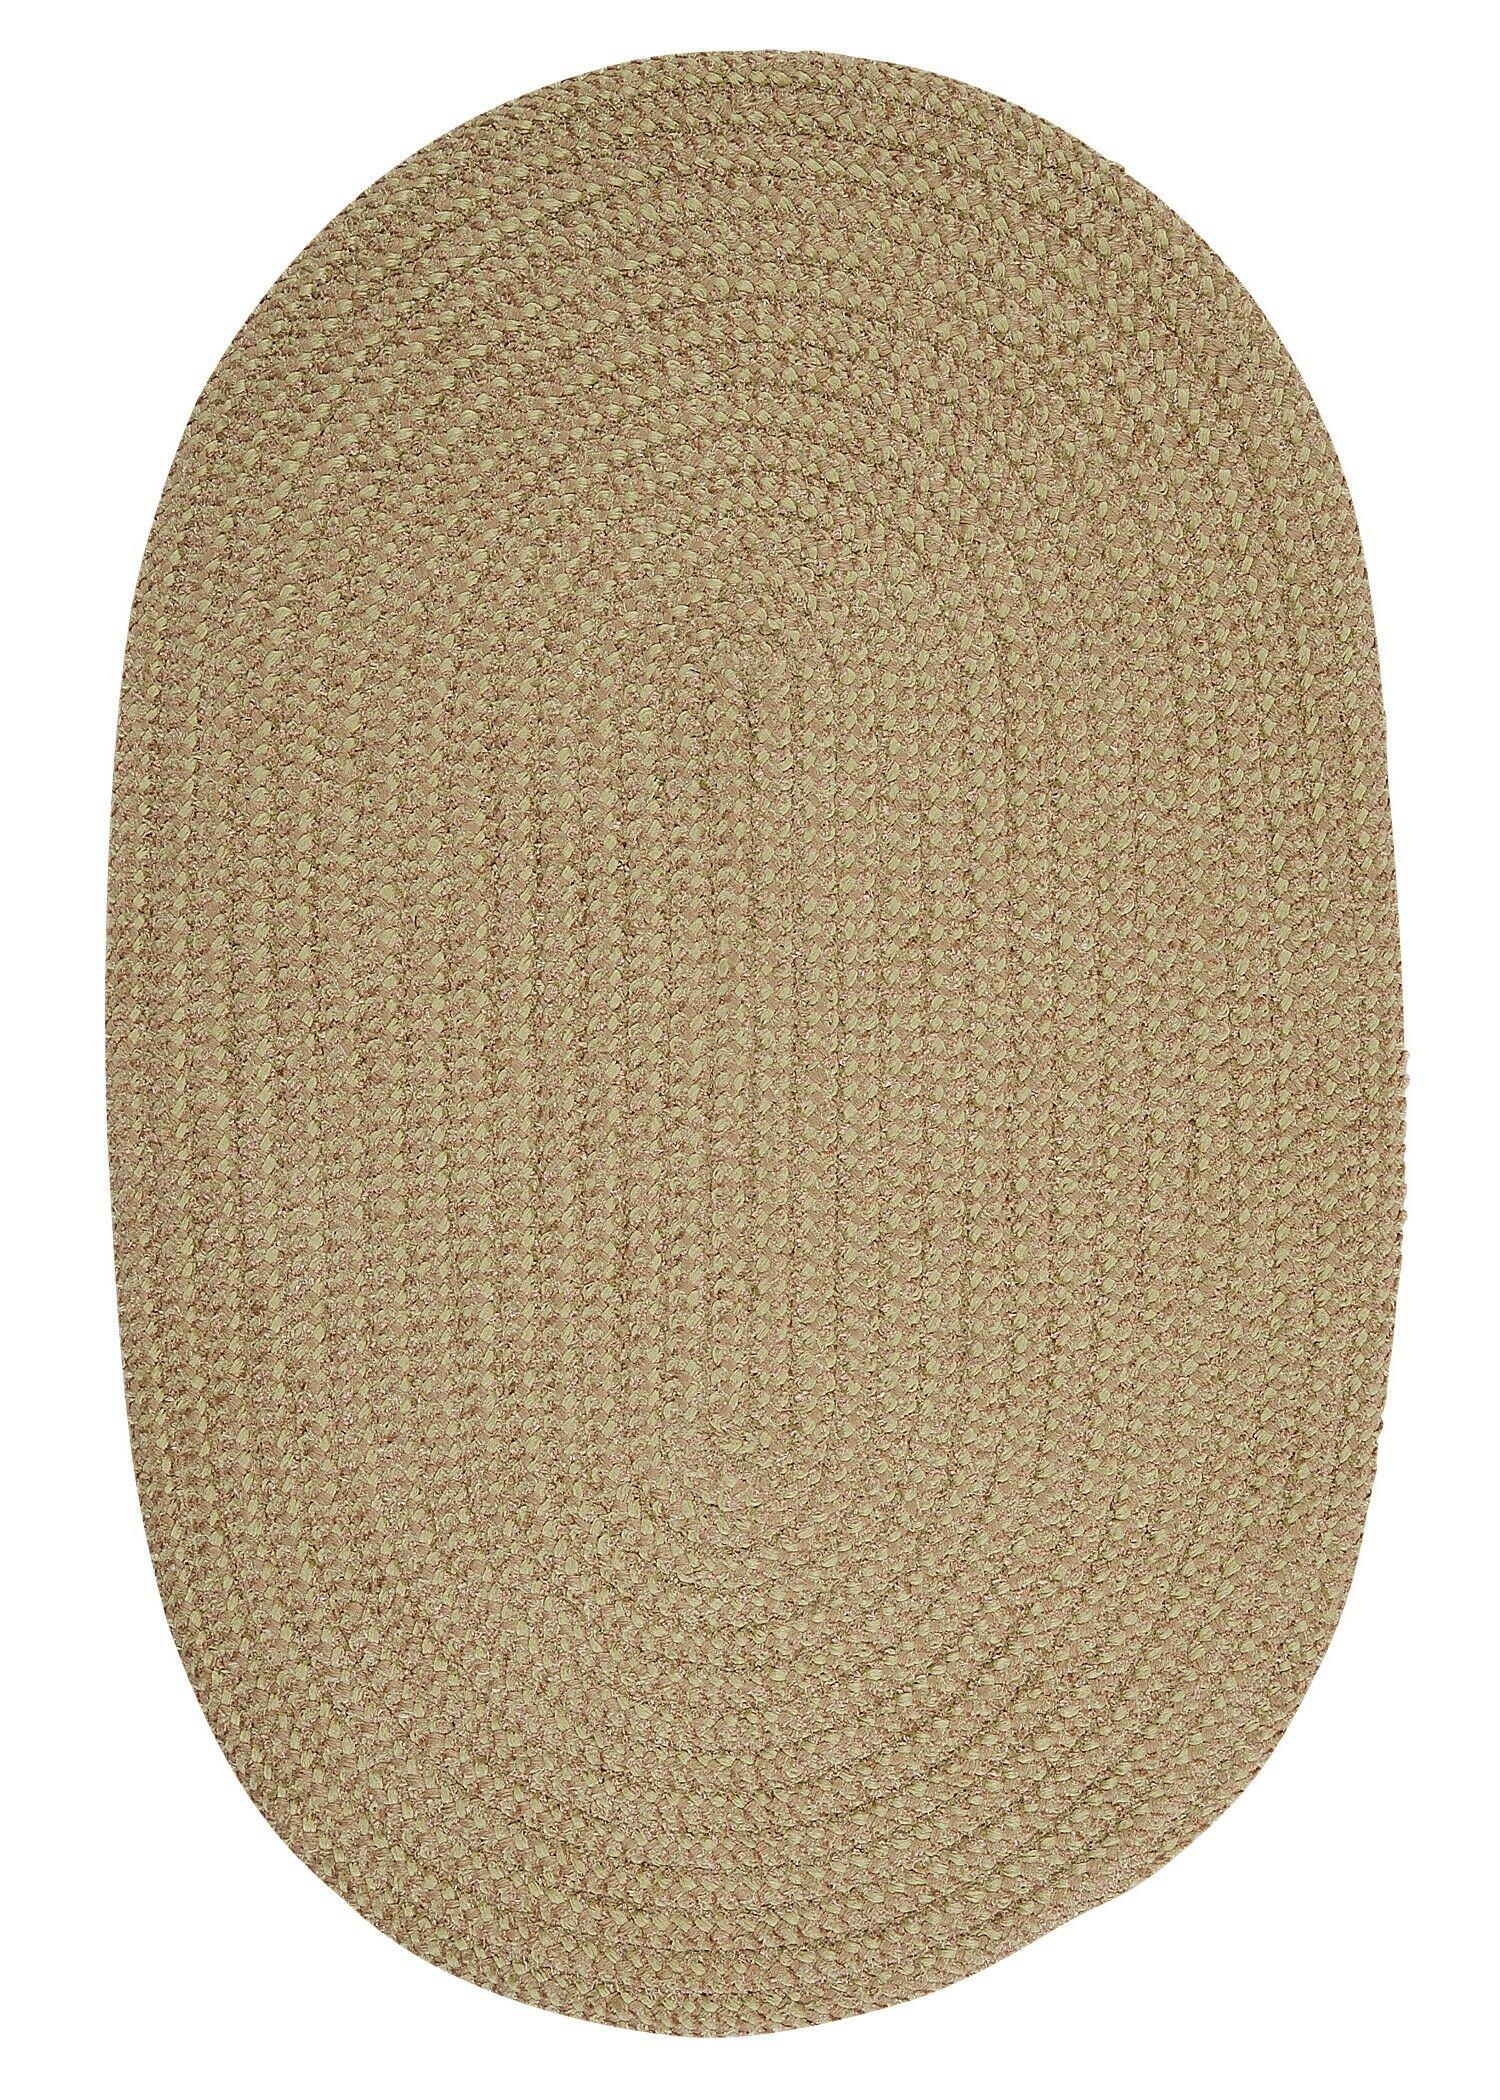 Hale Celery Check Indoor/Outdoor Area Rug Rug Size: Oval 8' x 11'